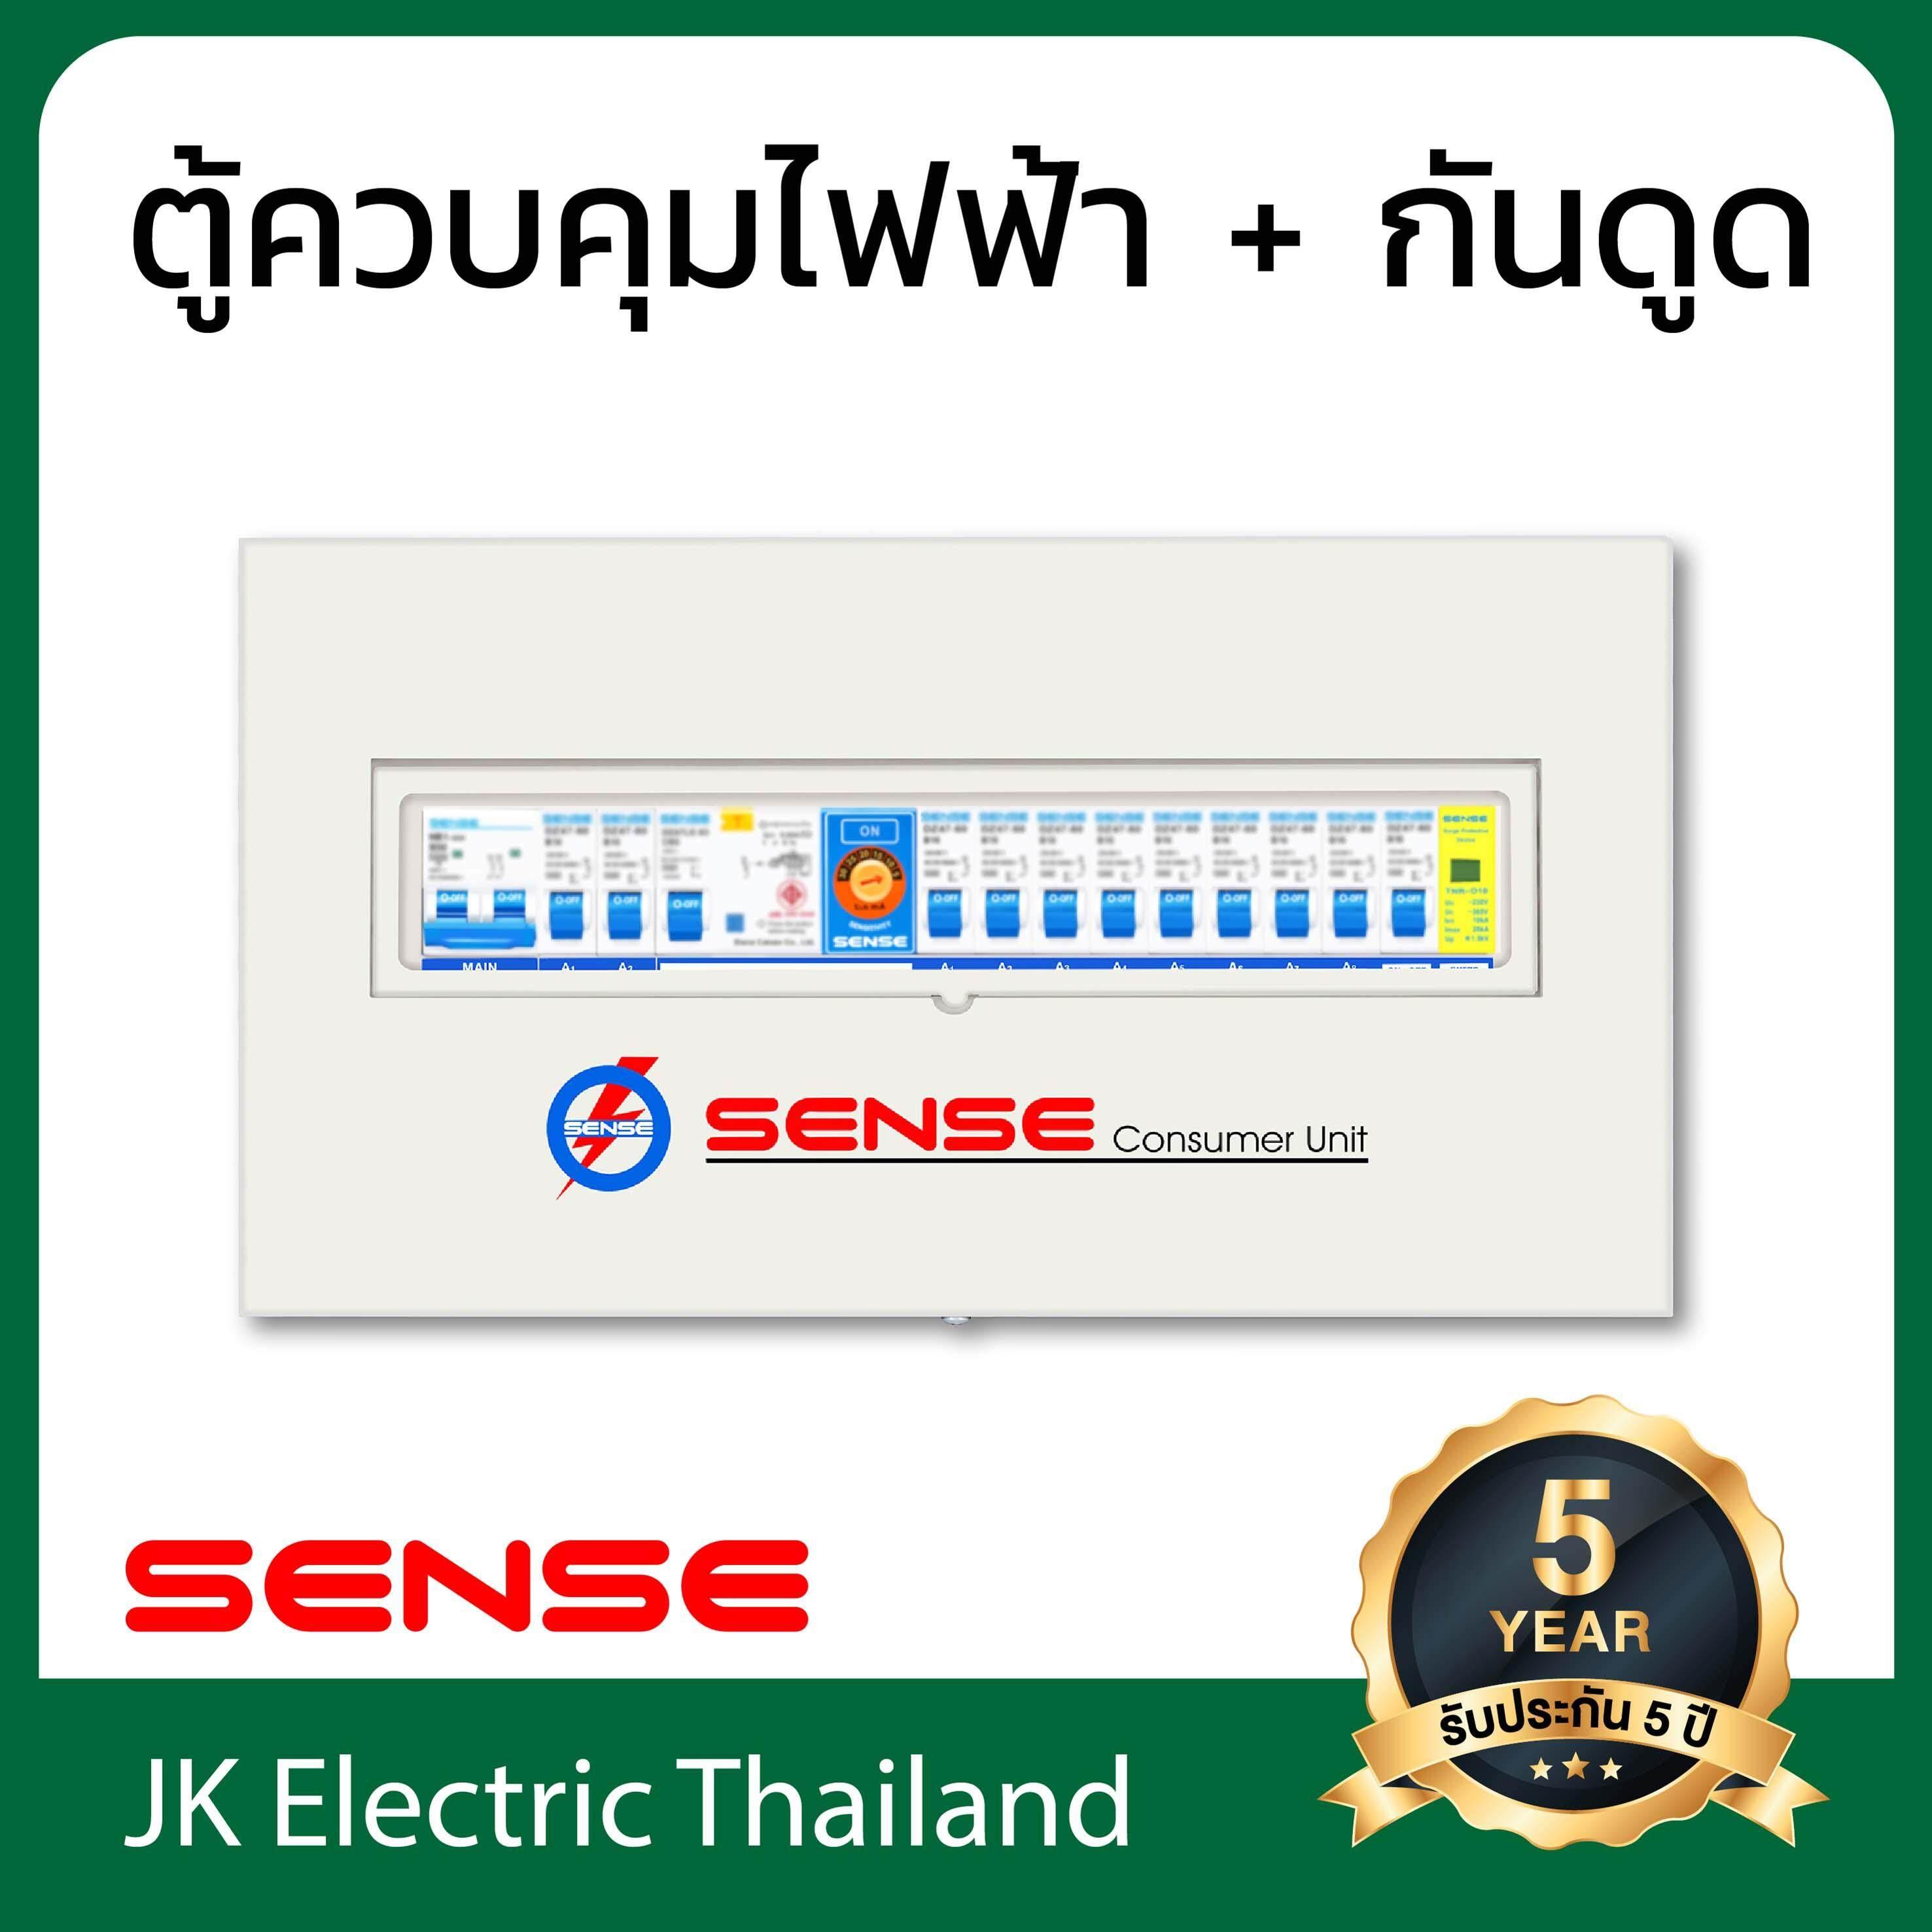 Sense ตู้ไฟ ตู้ควบคุมไฟฟ้า ตู้คอนซูมเมอร์ เซนส์ ชนิดแยกส่วน ขนาด 10 ช่อง พร้อม เครื่องตัดไฟรั่ว (rcd) และ อุปกรณ์ป้องกันฟ้าผ่า (spd) รุ่น U10n (เลือกขนาดเมน 32a, 50a, 63a และลูกย่อย 10a, 16a, 20a, 32a ตามต้องการ) ป้องกันไฟดูด ไฟช็อต ไฟรั่ว ใช้ไฟเกิน.